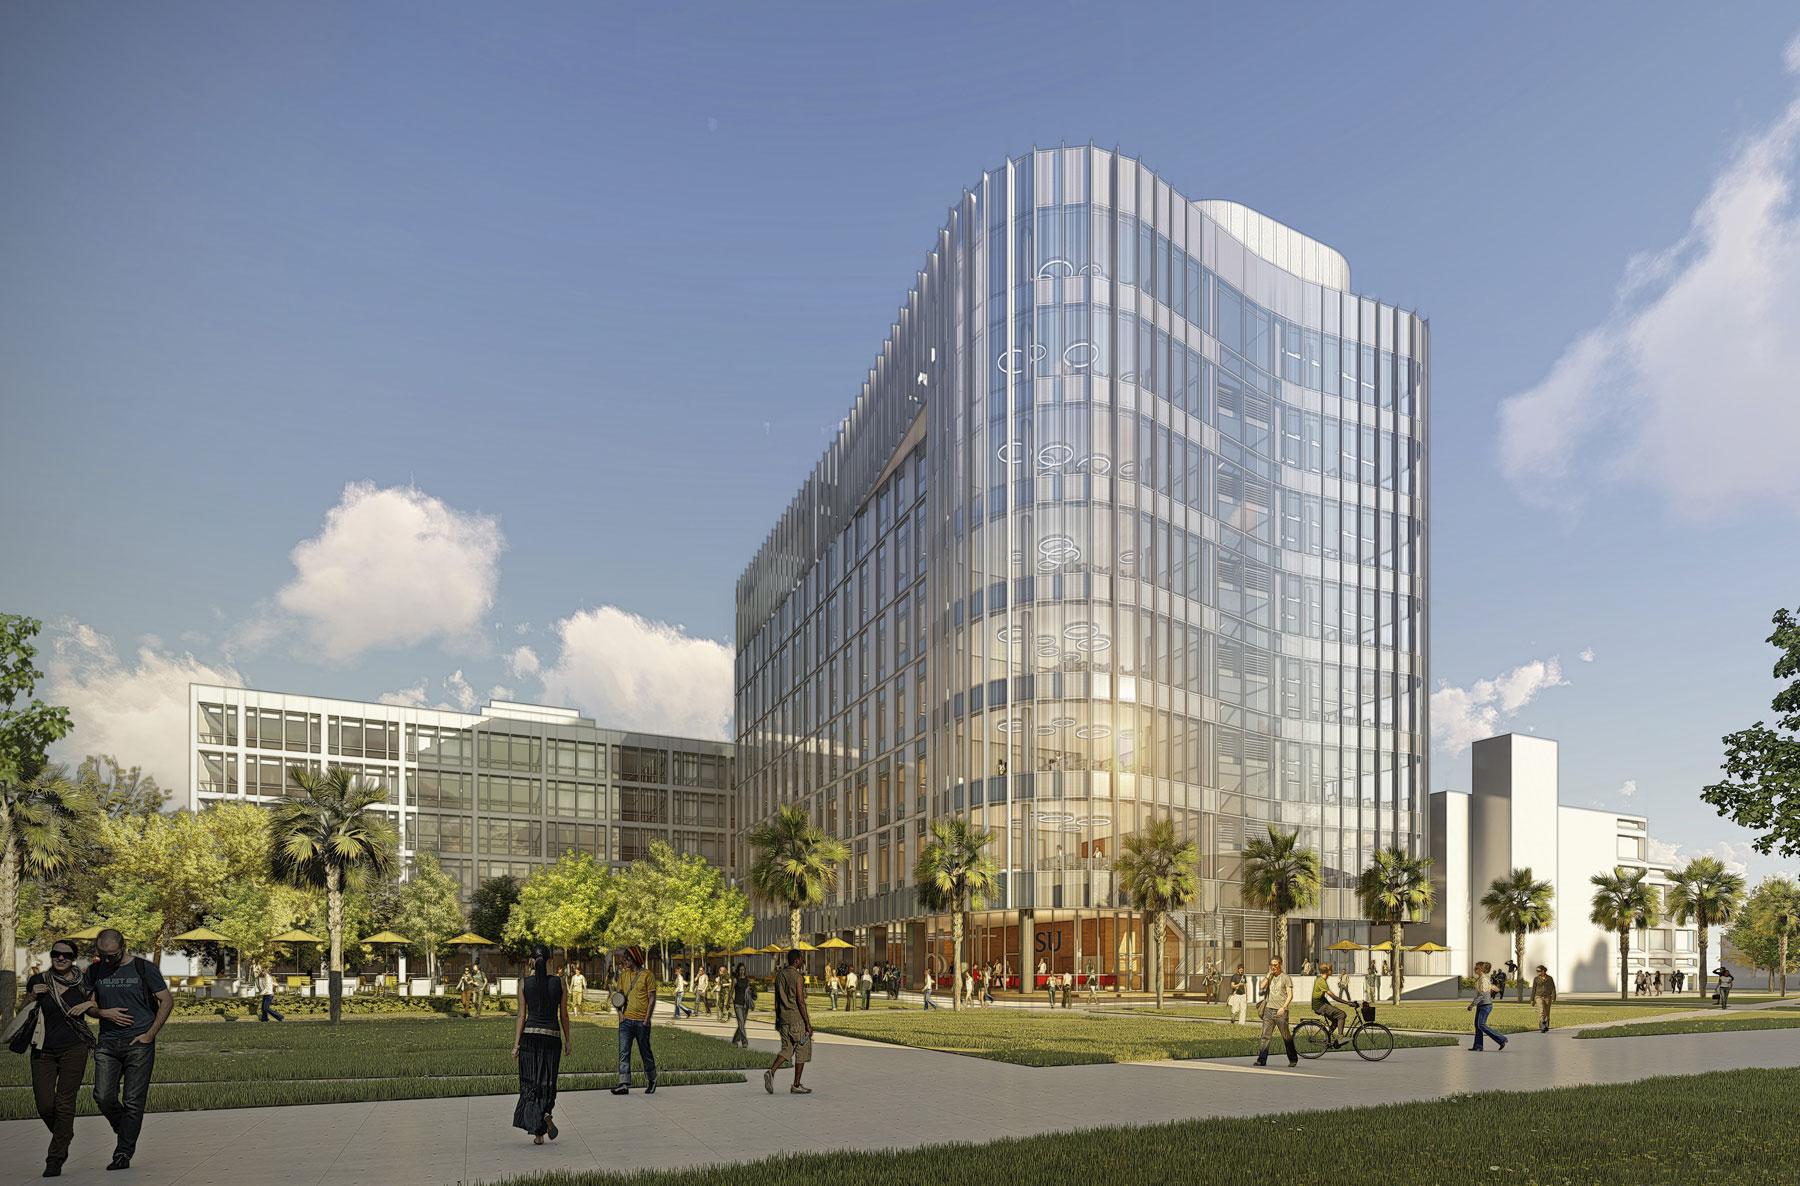 San Jose State University - Interdisciplinary Science Building (ISB)